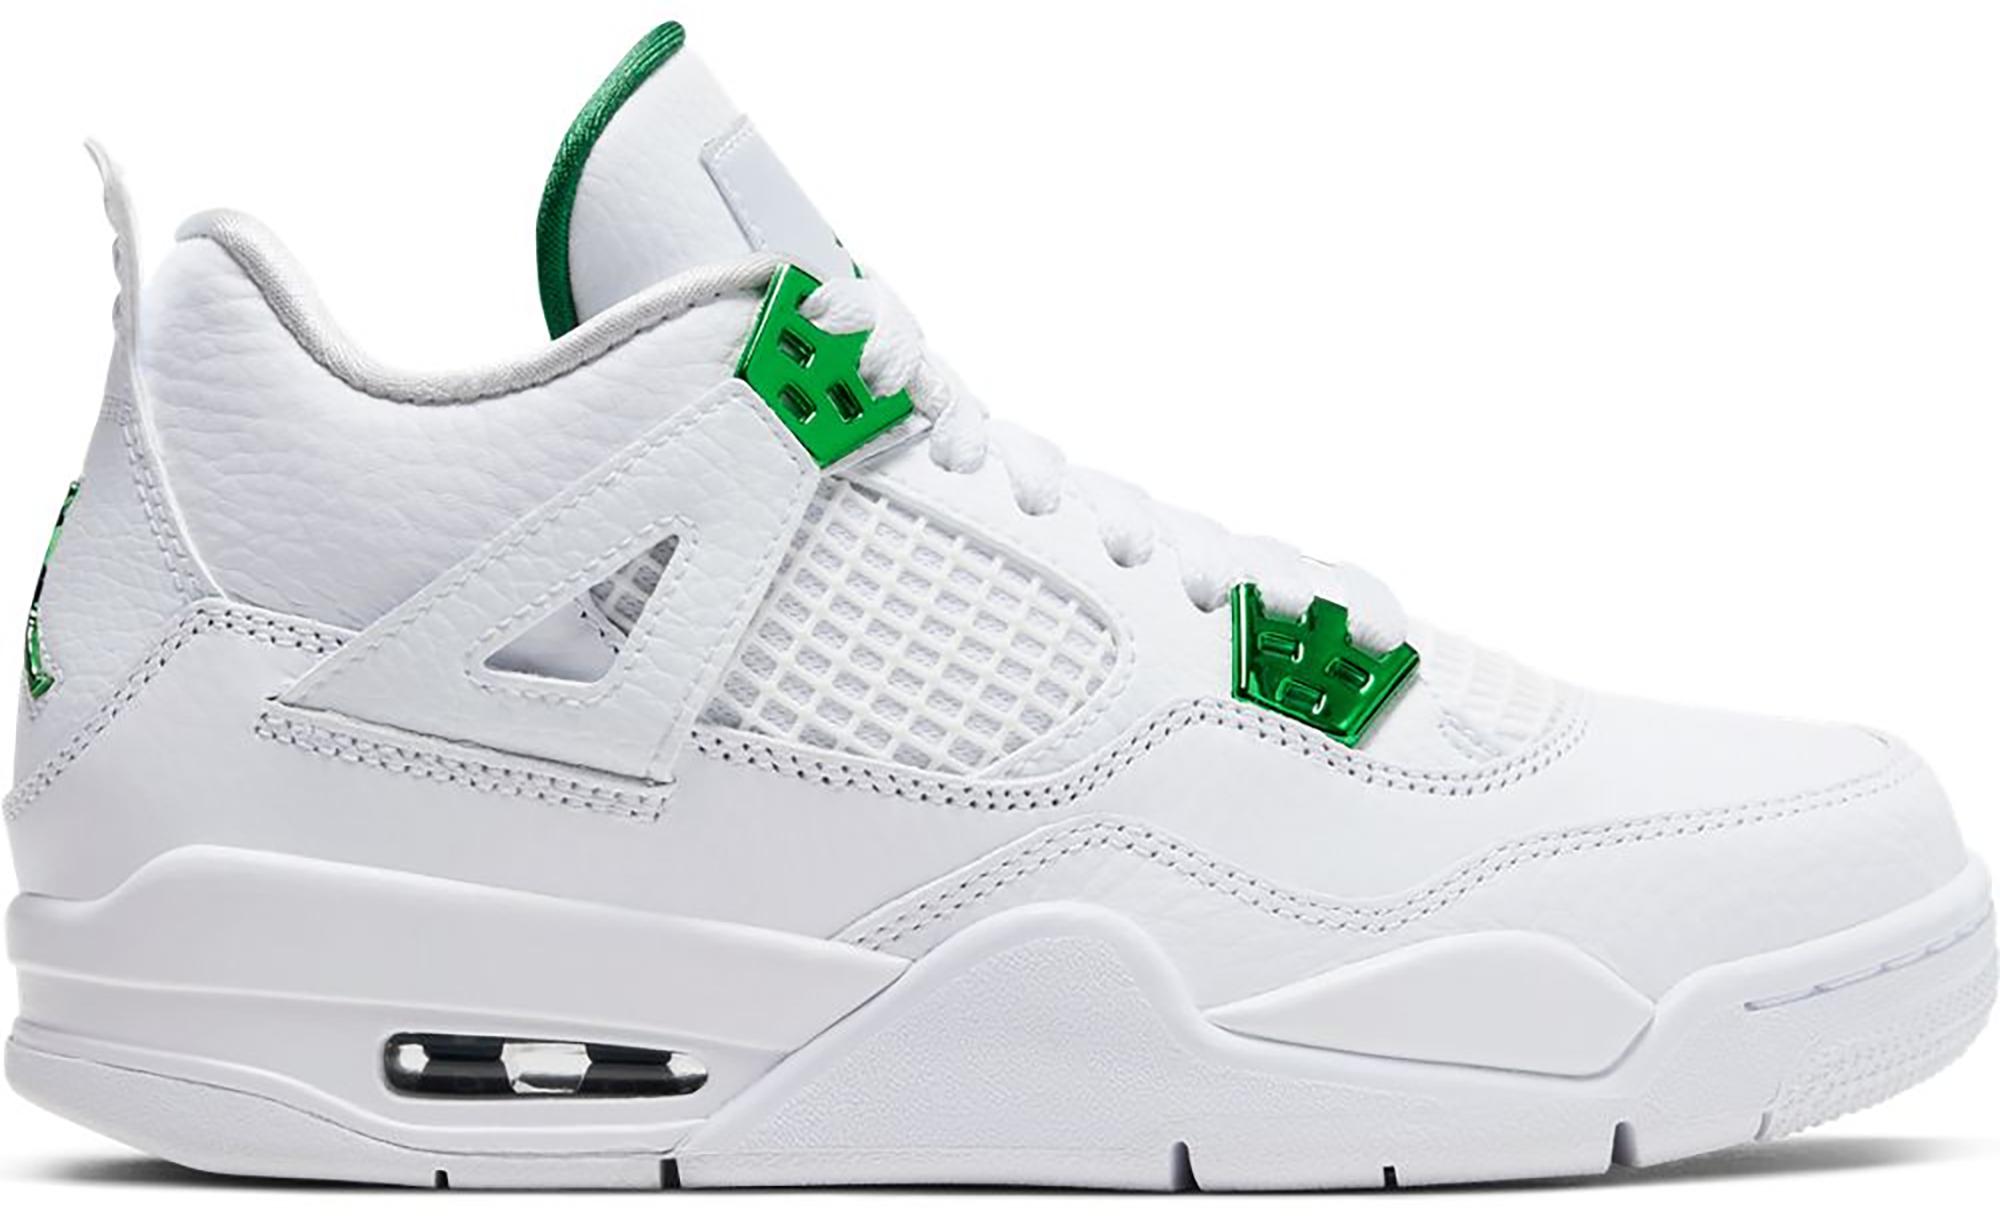 Jordan 4 Retro Metallic Green (GS